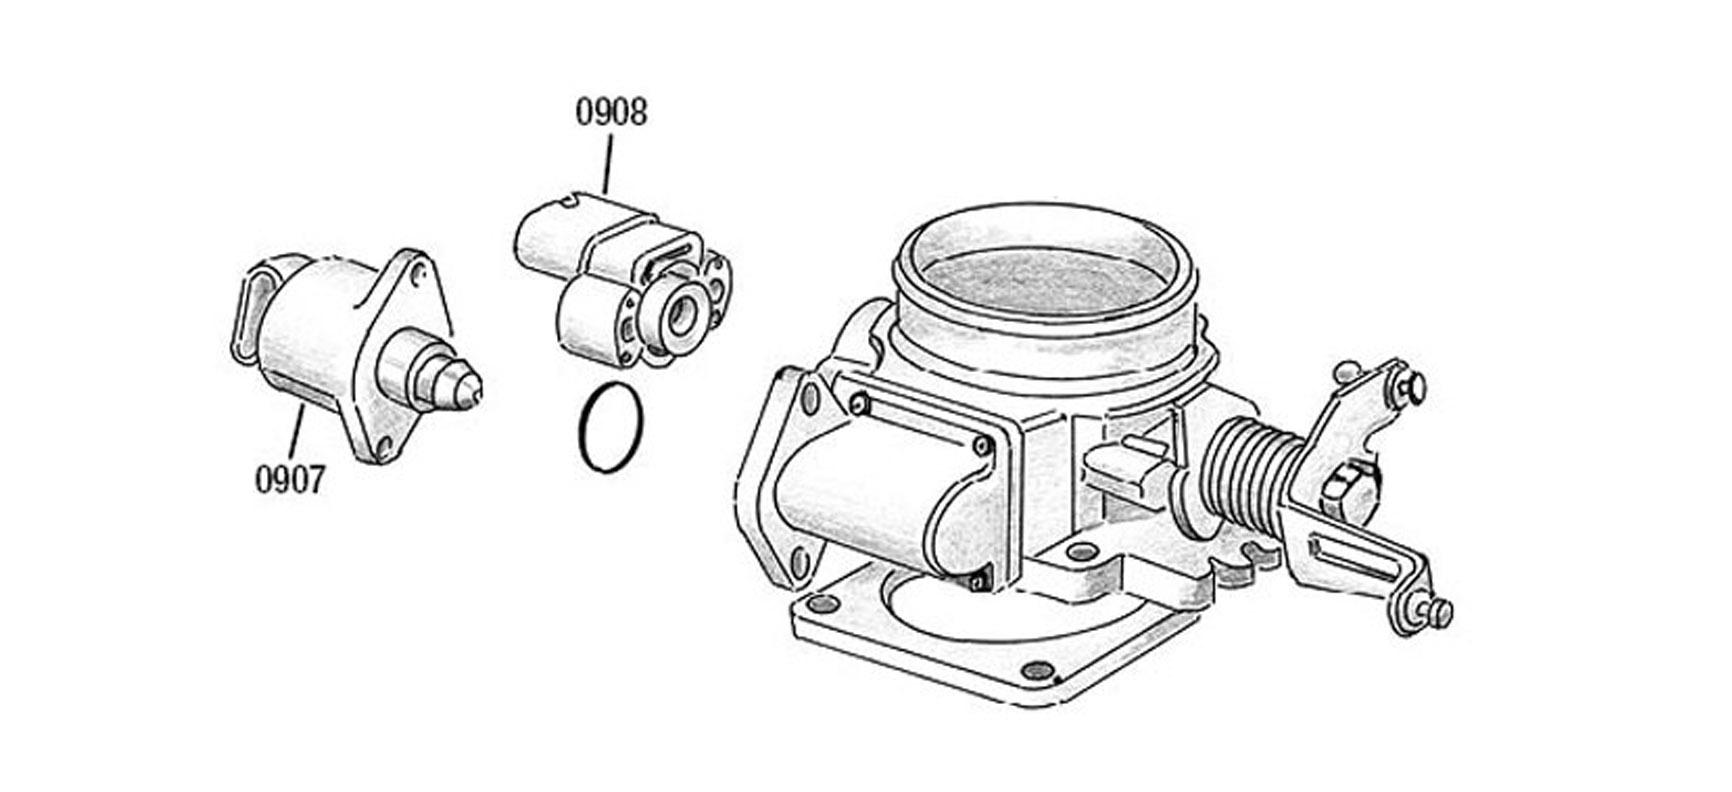 Wj Wg Carburateur Admission